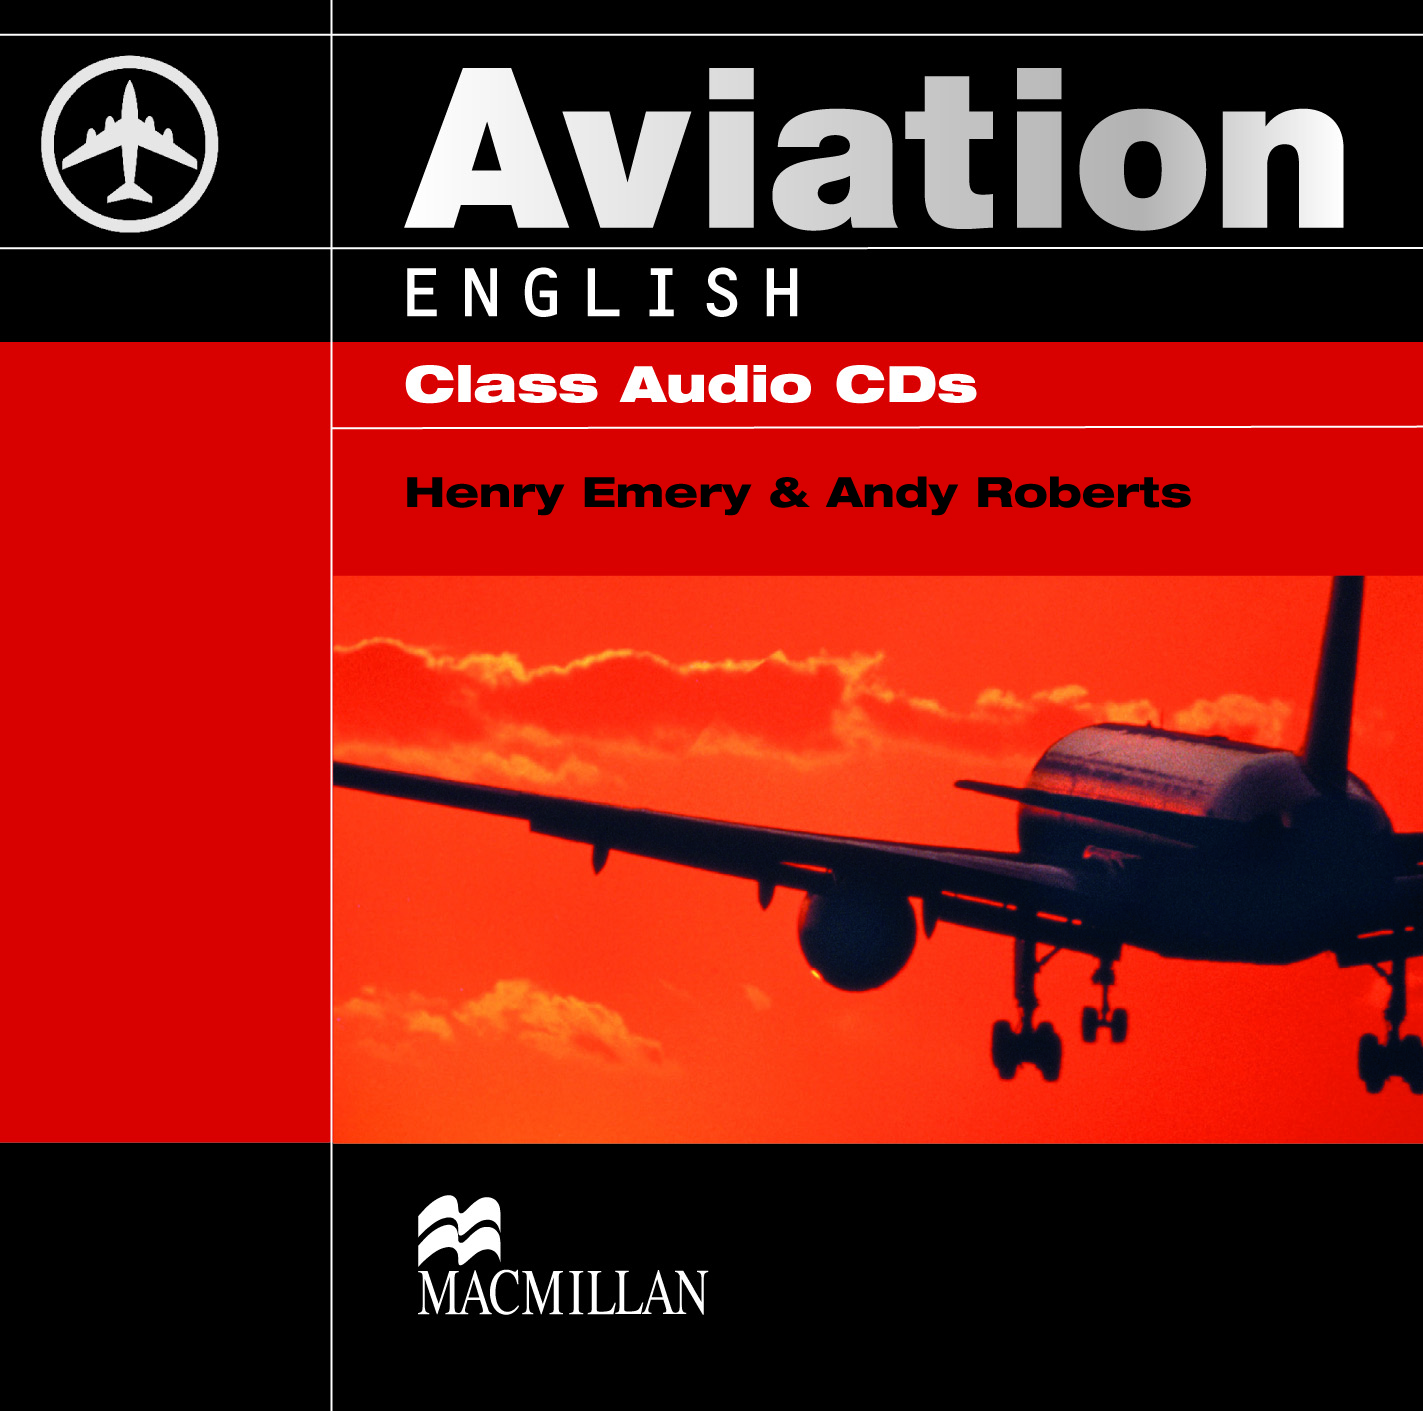 Aviation English Class CDx2